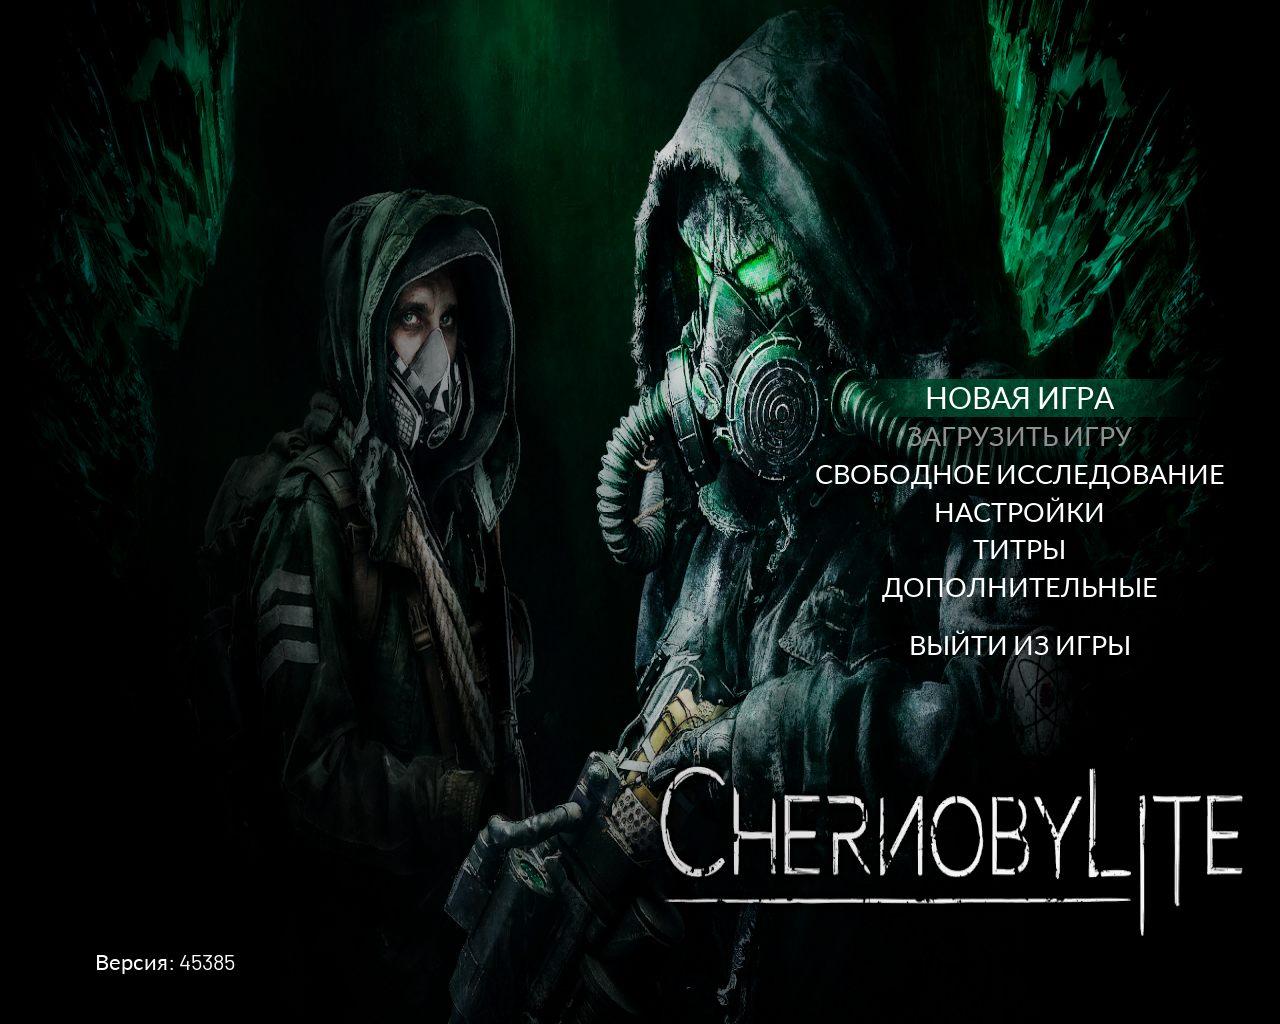 ChernobylGame-Win64-Shipping 2021-07-29 01-34-35-72.bmp.jpg